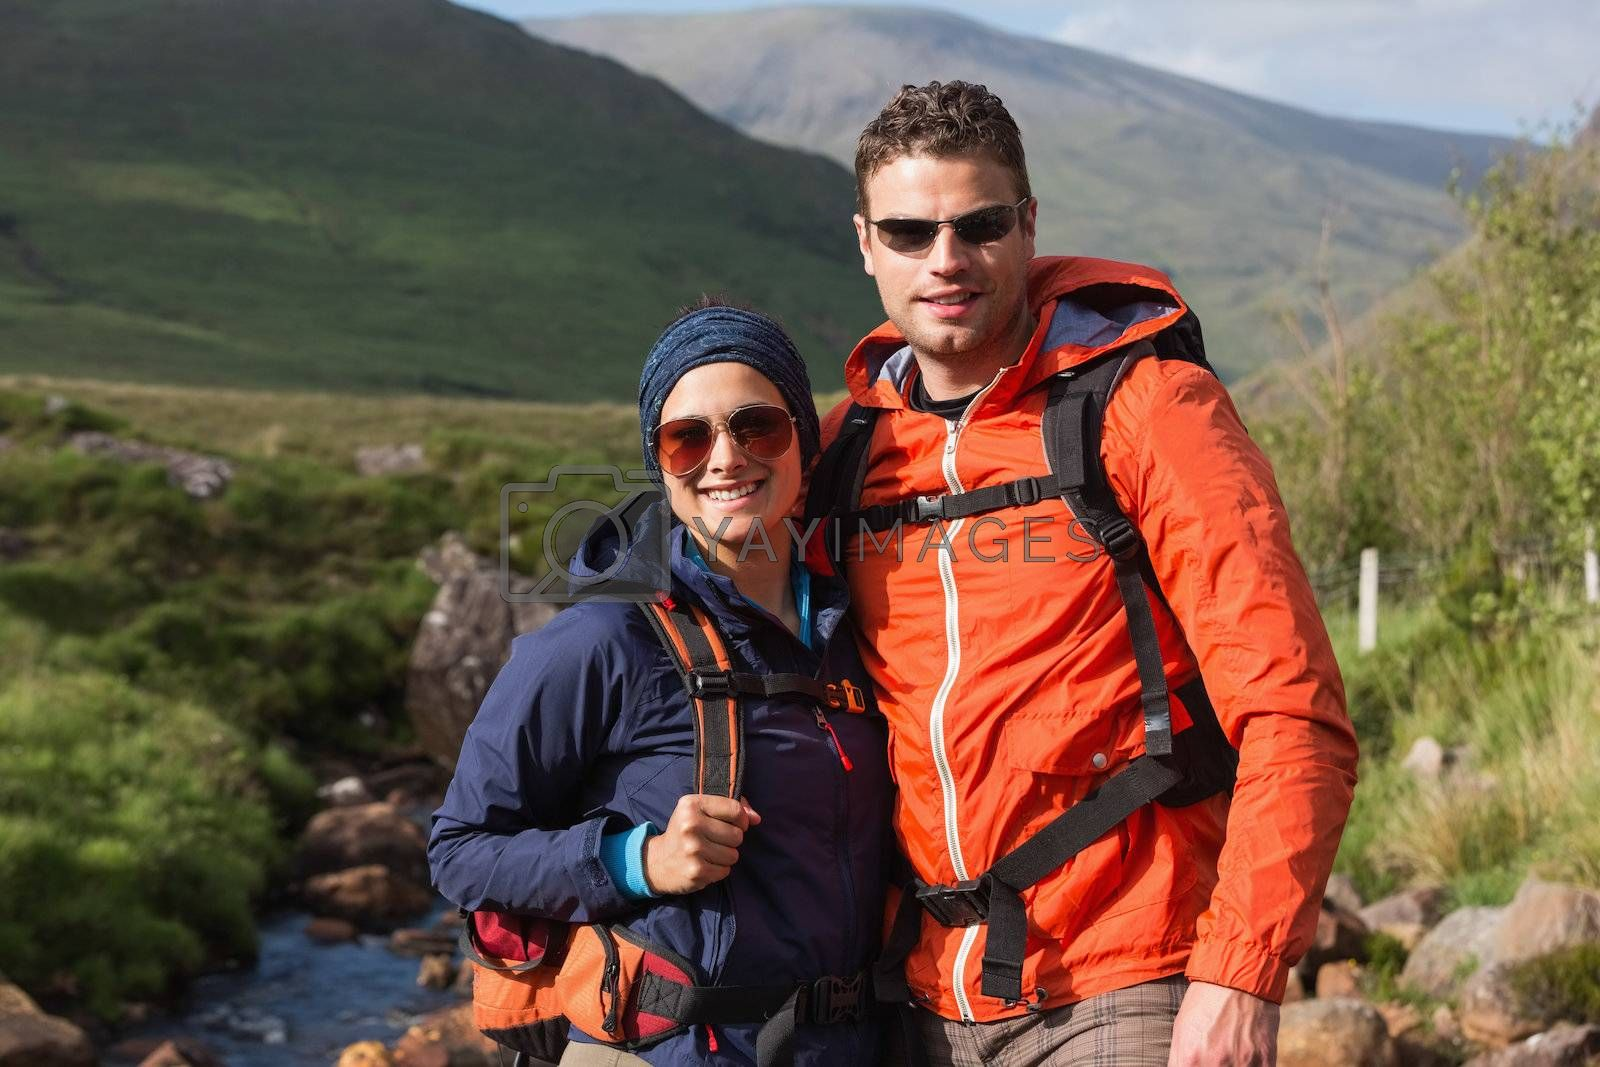 Happy couple on hike by Wavebreakmedia